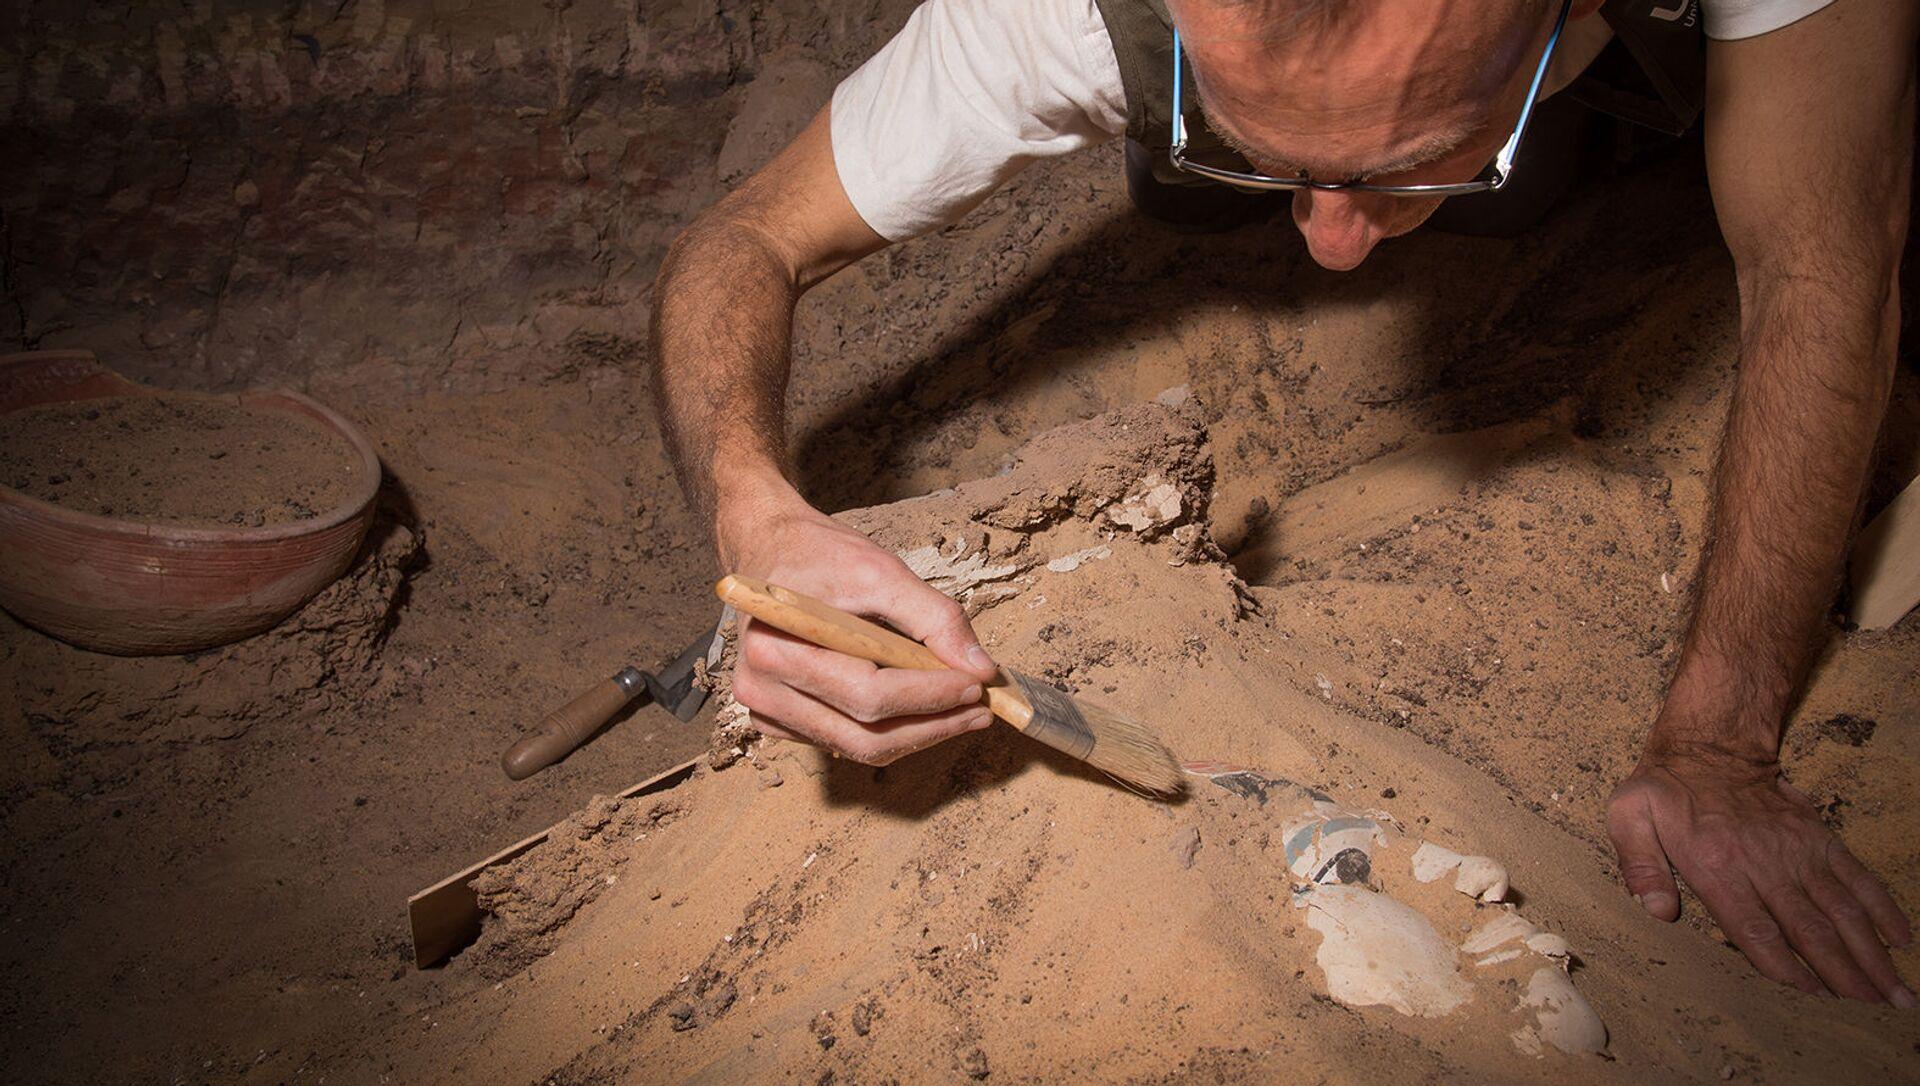 Wykopaliska archeologiczne w Qubbet el-Hawa, Egipt. - Sputnik Polska, 1920, 17.04.2021